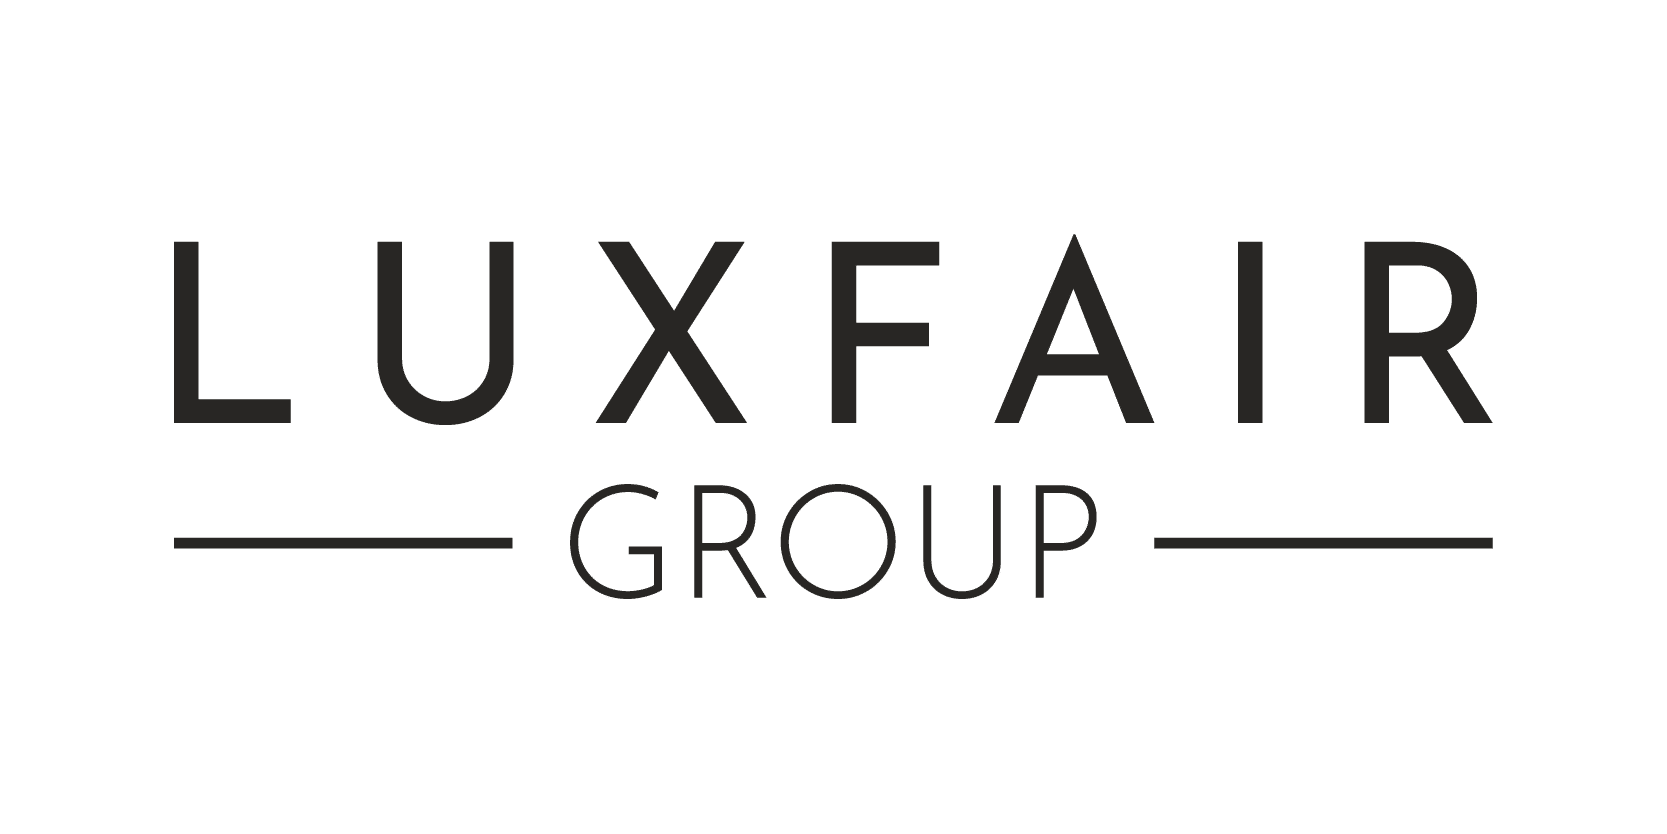 Luxfair Group